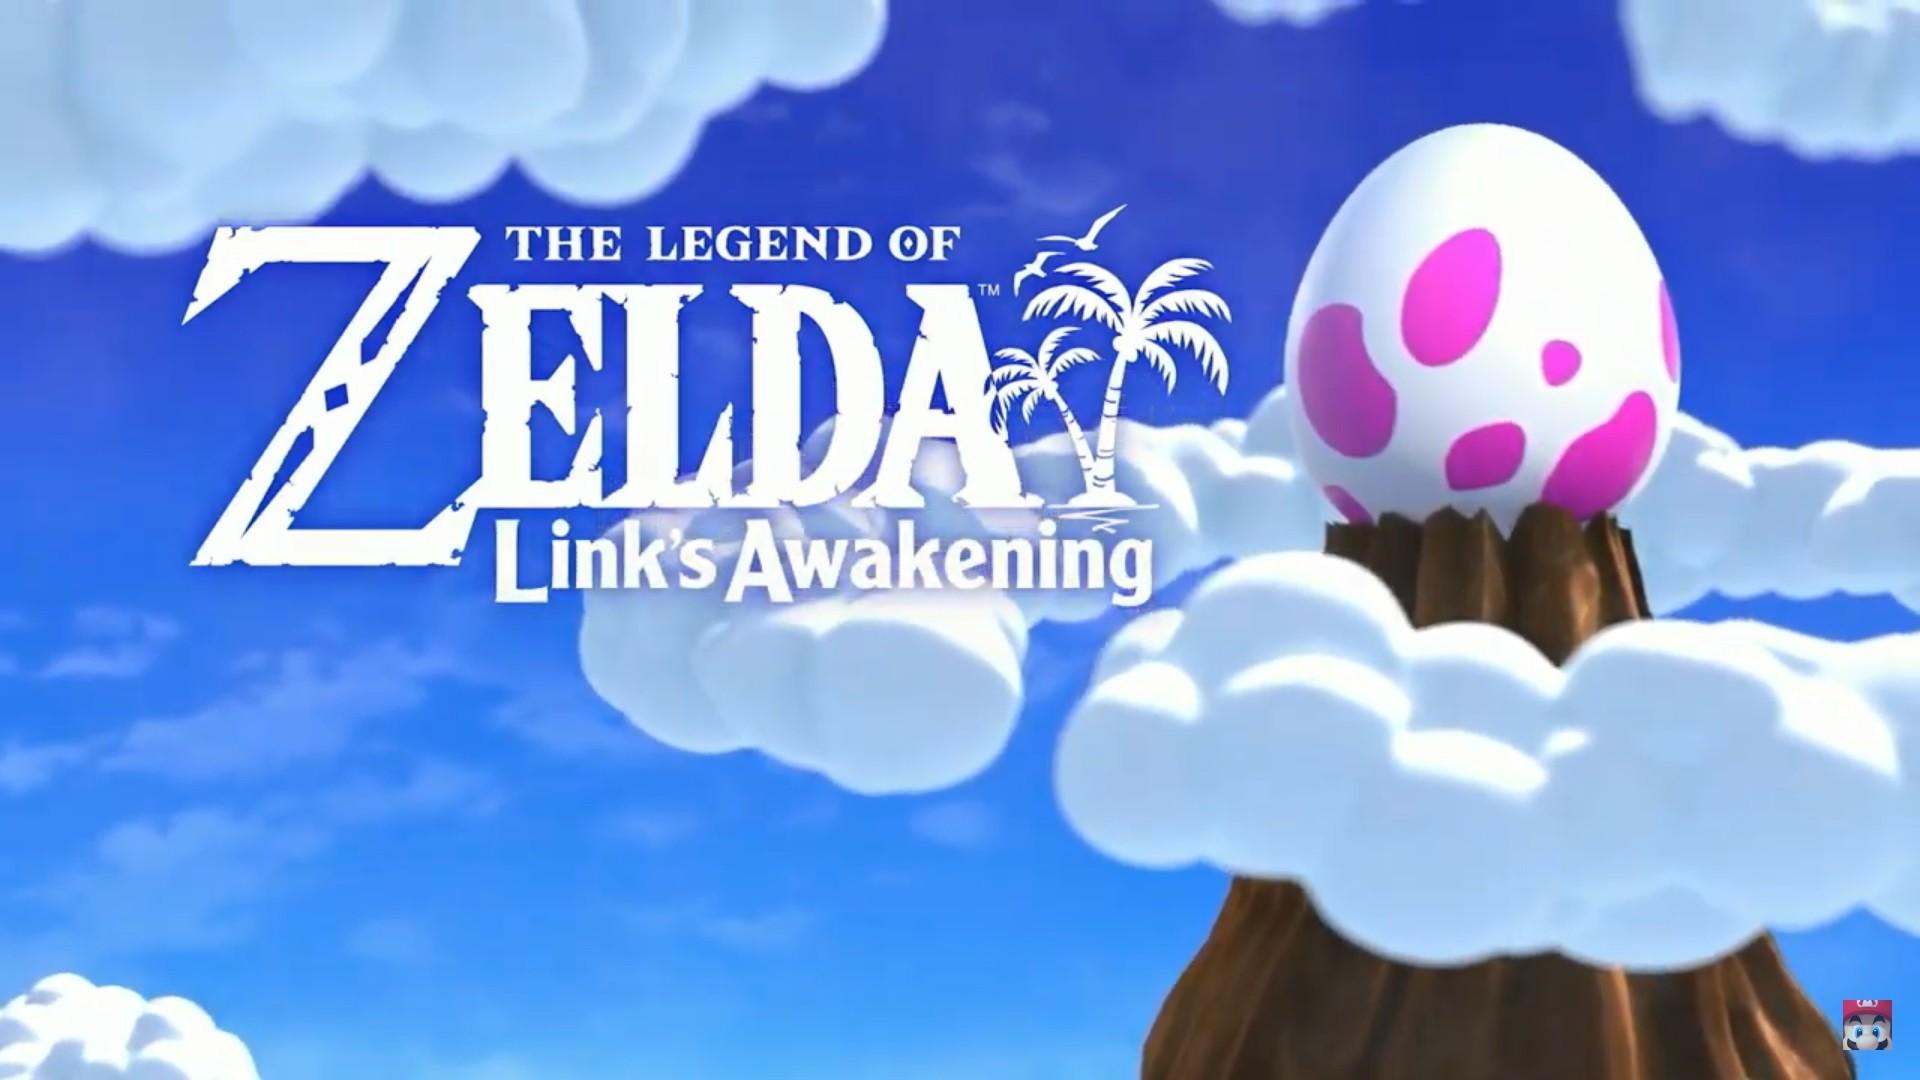 The Legend Of Zelda Links Awakening Arrives On The Switch On